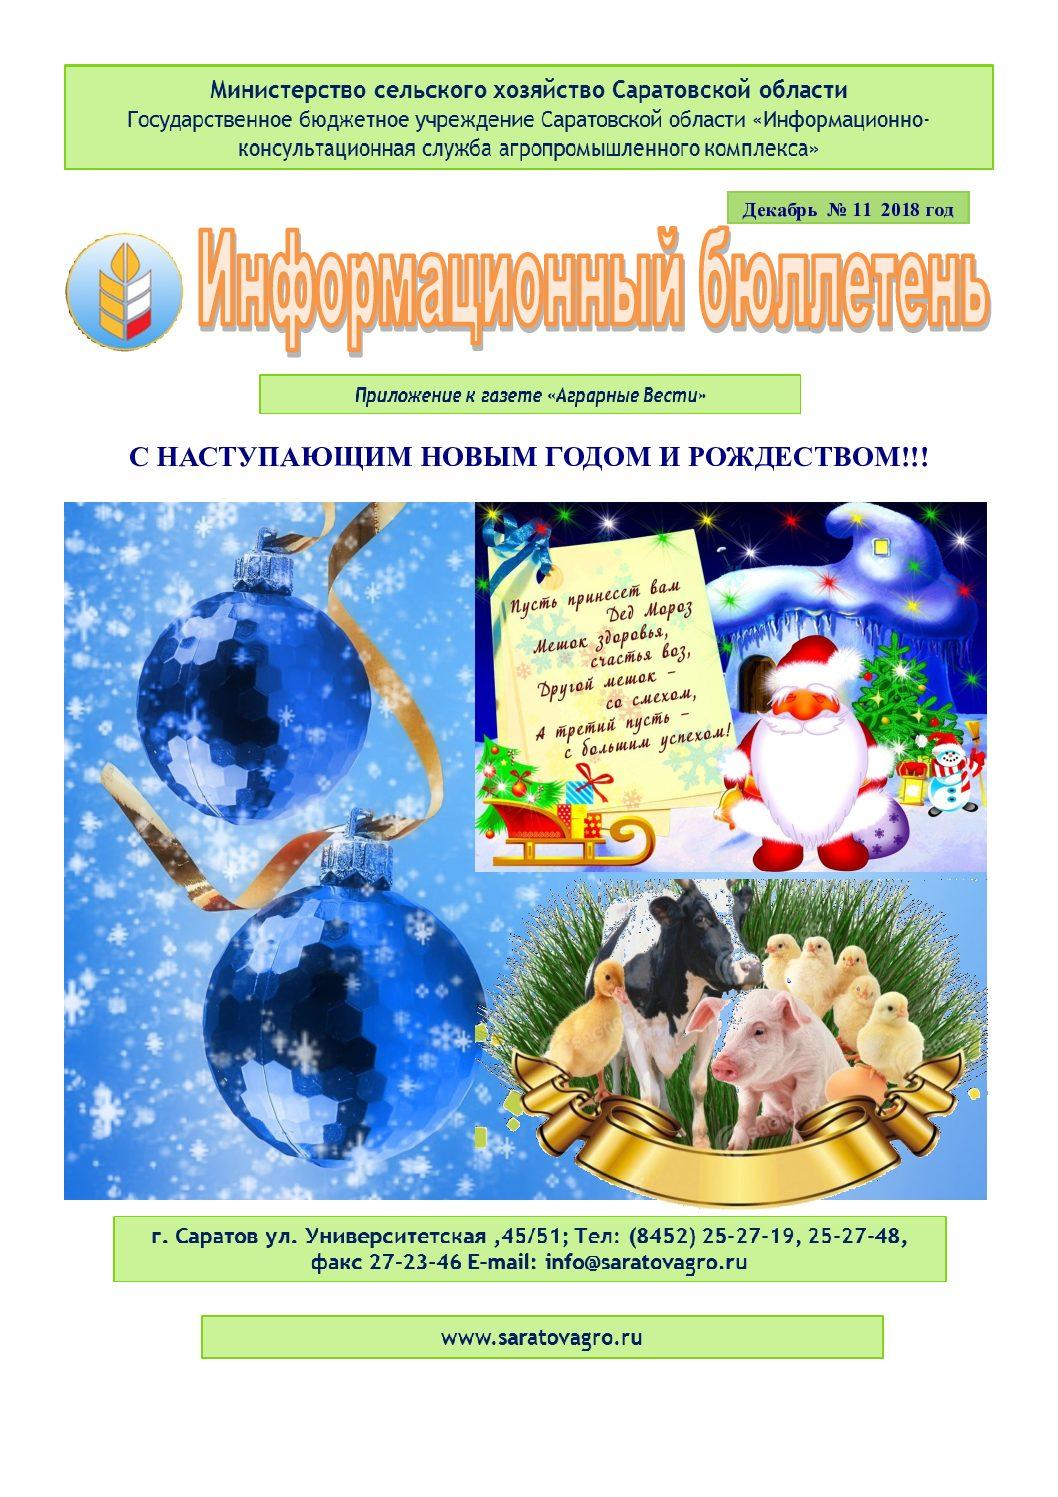 https://saratovagro.ru/wp-content/uploads/2020/08/11.2018-1-pdf.jpg